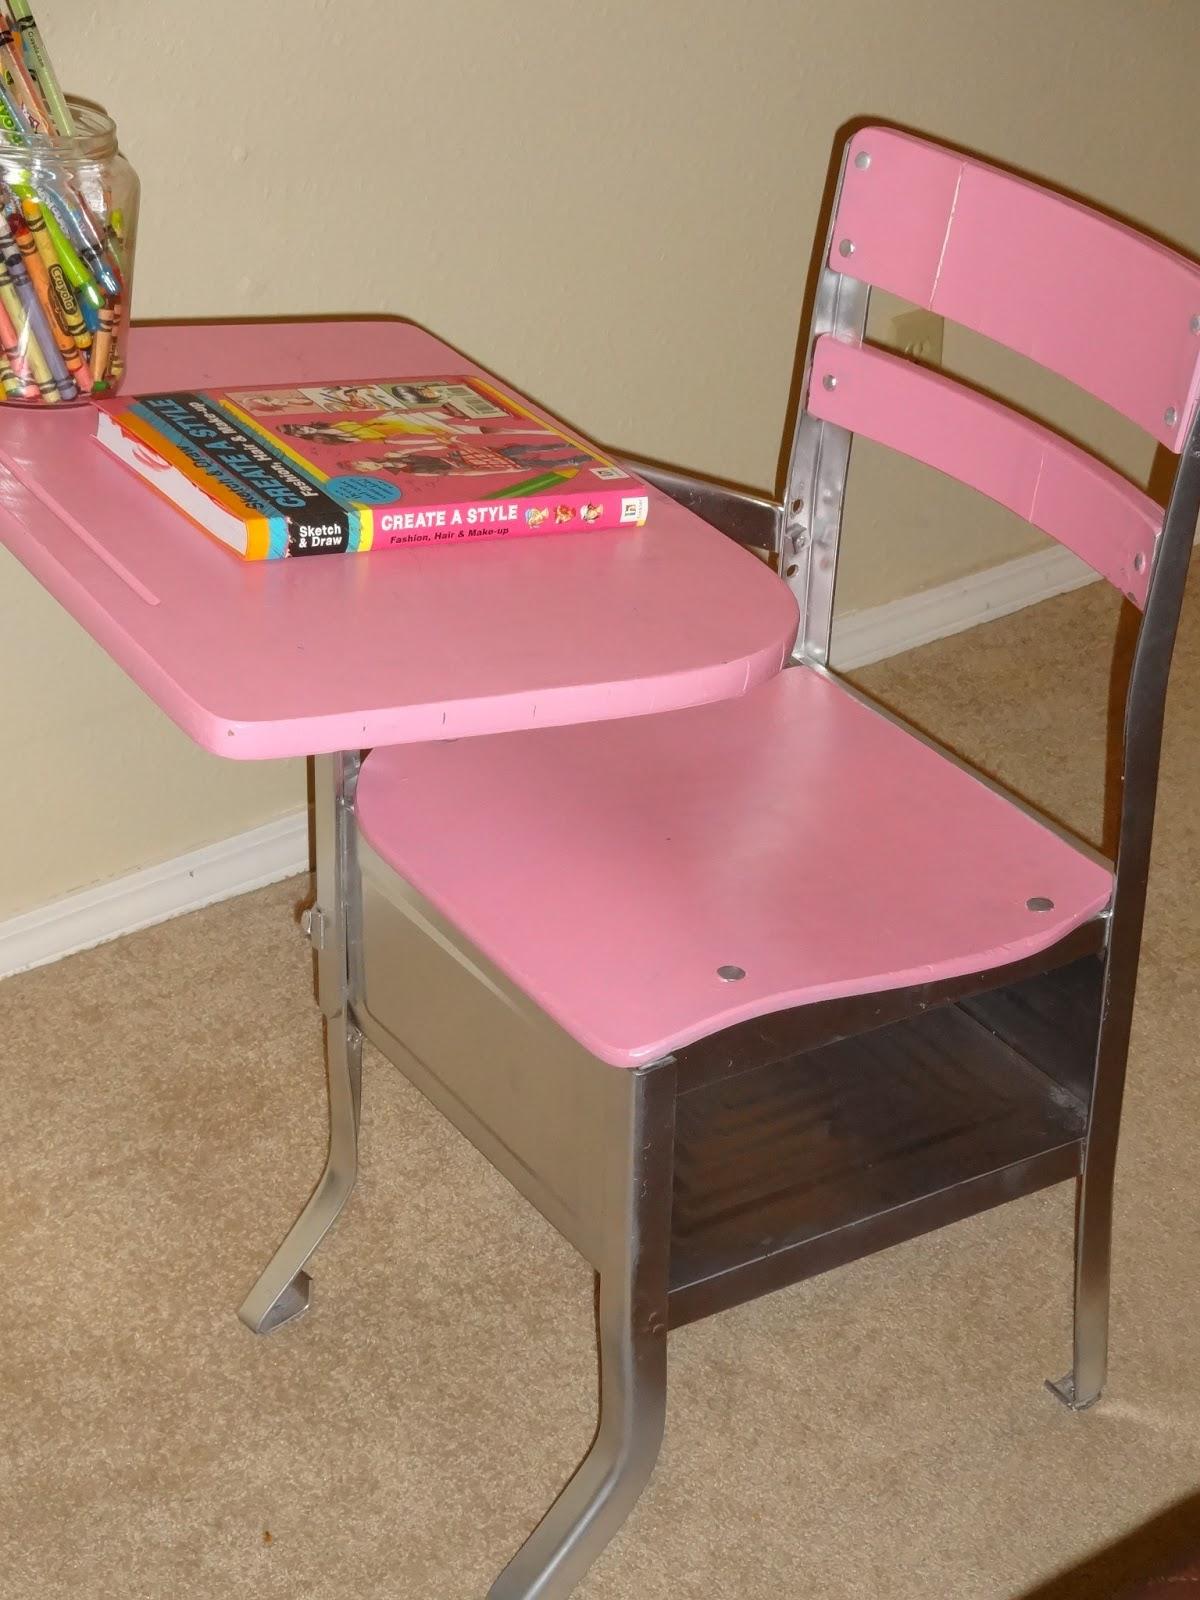 tornado alley creations before and after antique school desk redo. Black Bedroom Furniture Sets. Home Design Ideas